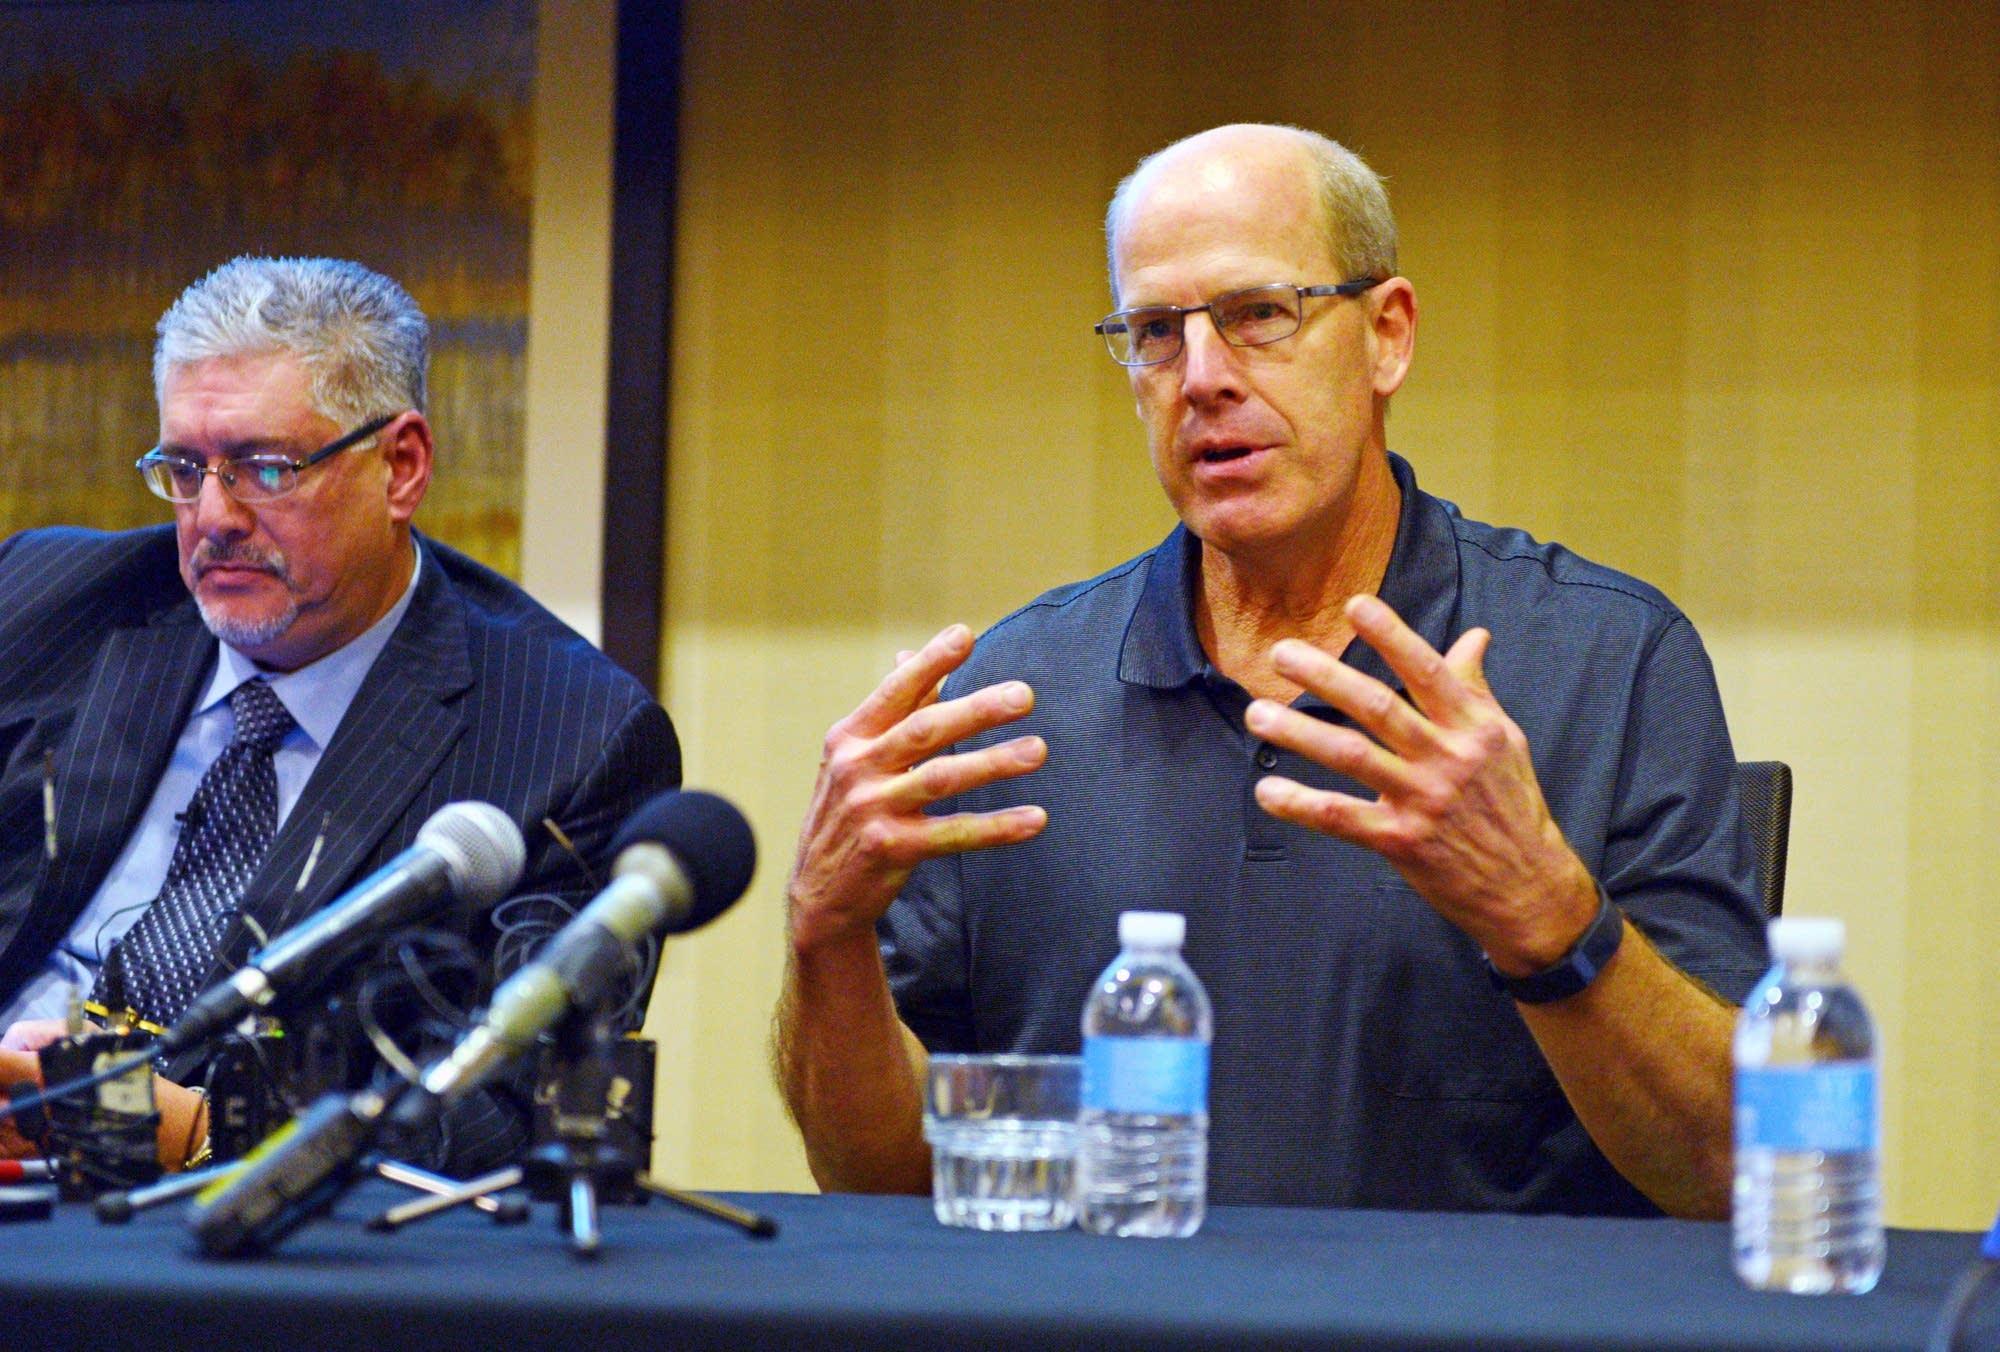 Daniel Rassier speaks at a press conference.